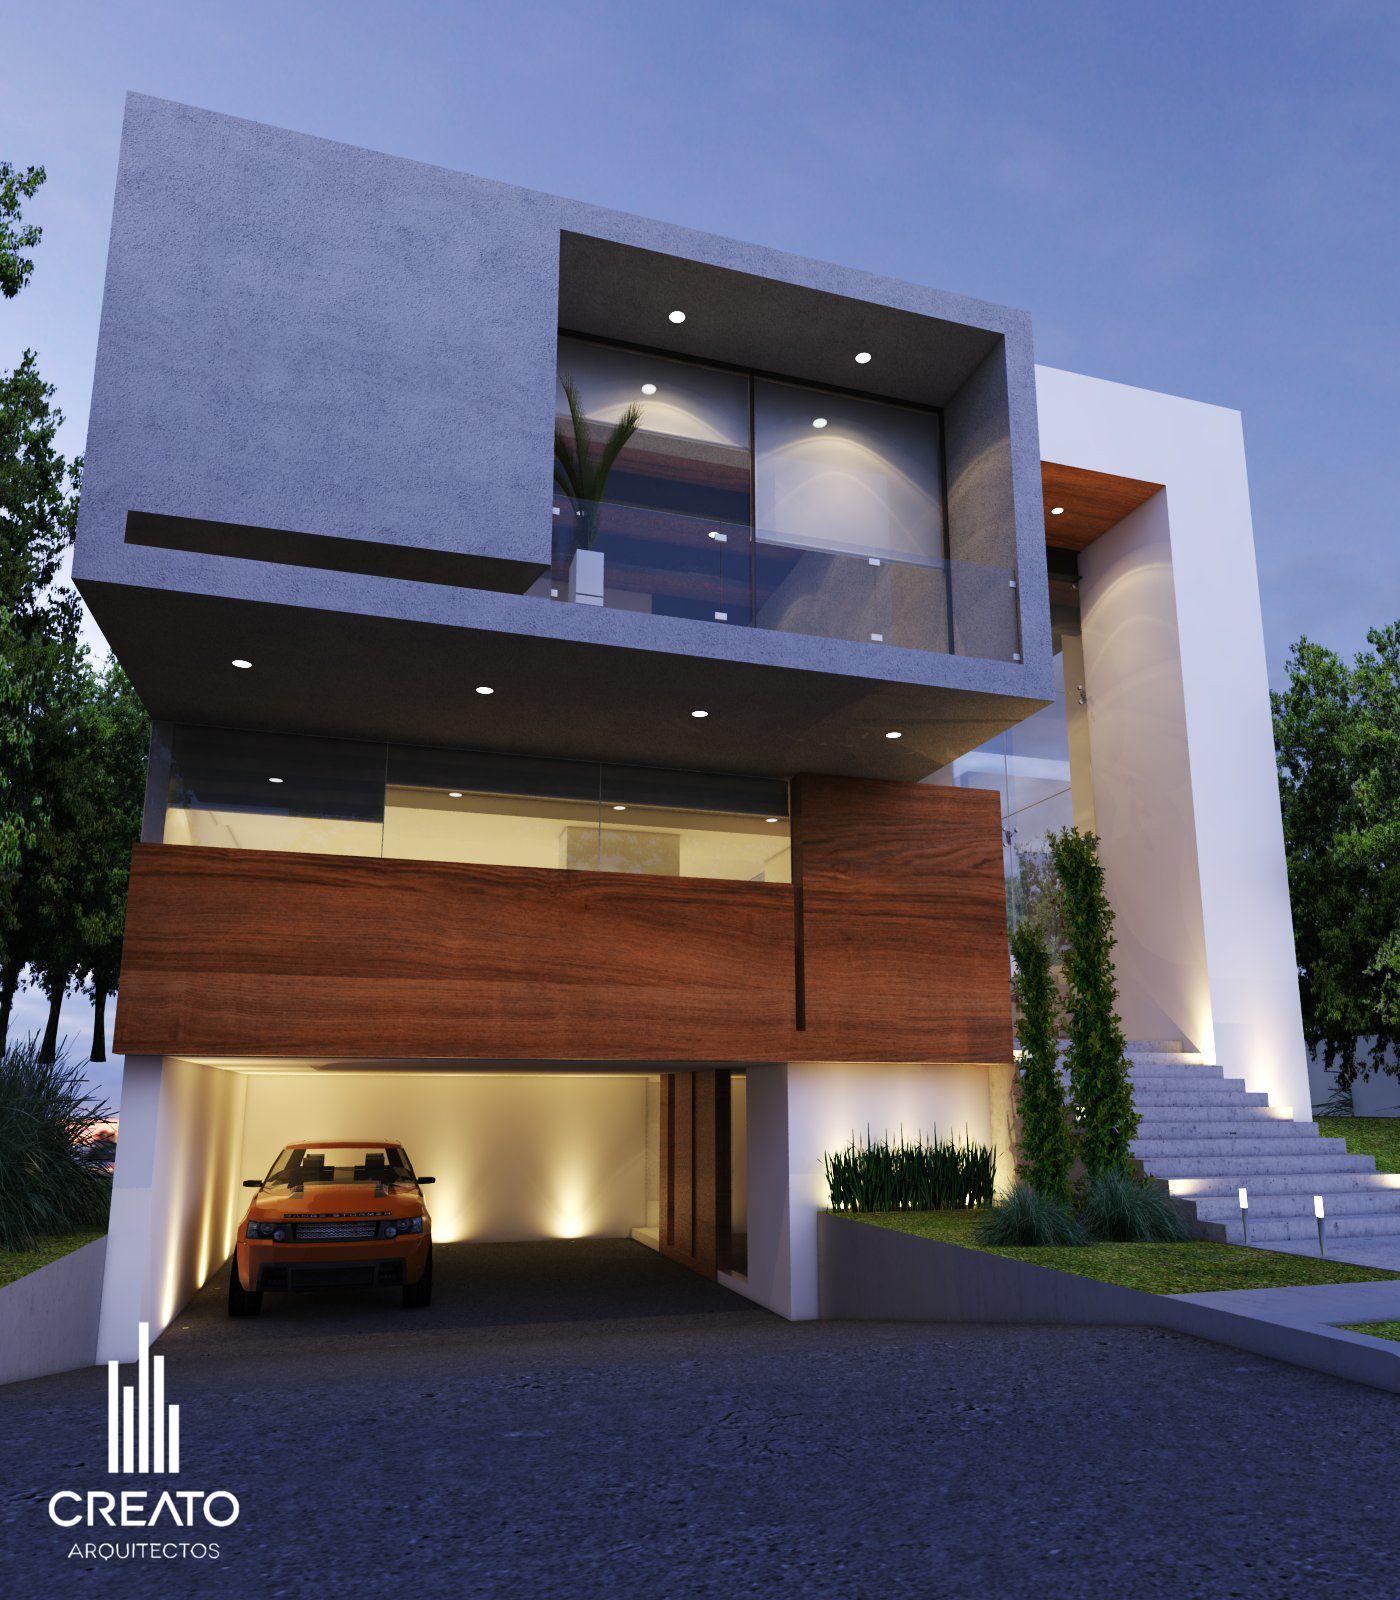 Casa campo lago por creato arquitectos salas casas for Arquitectos de la arquitectura moderna